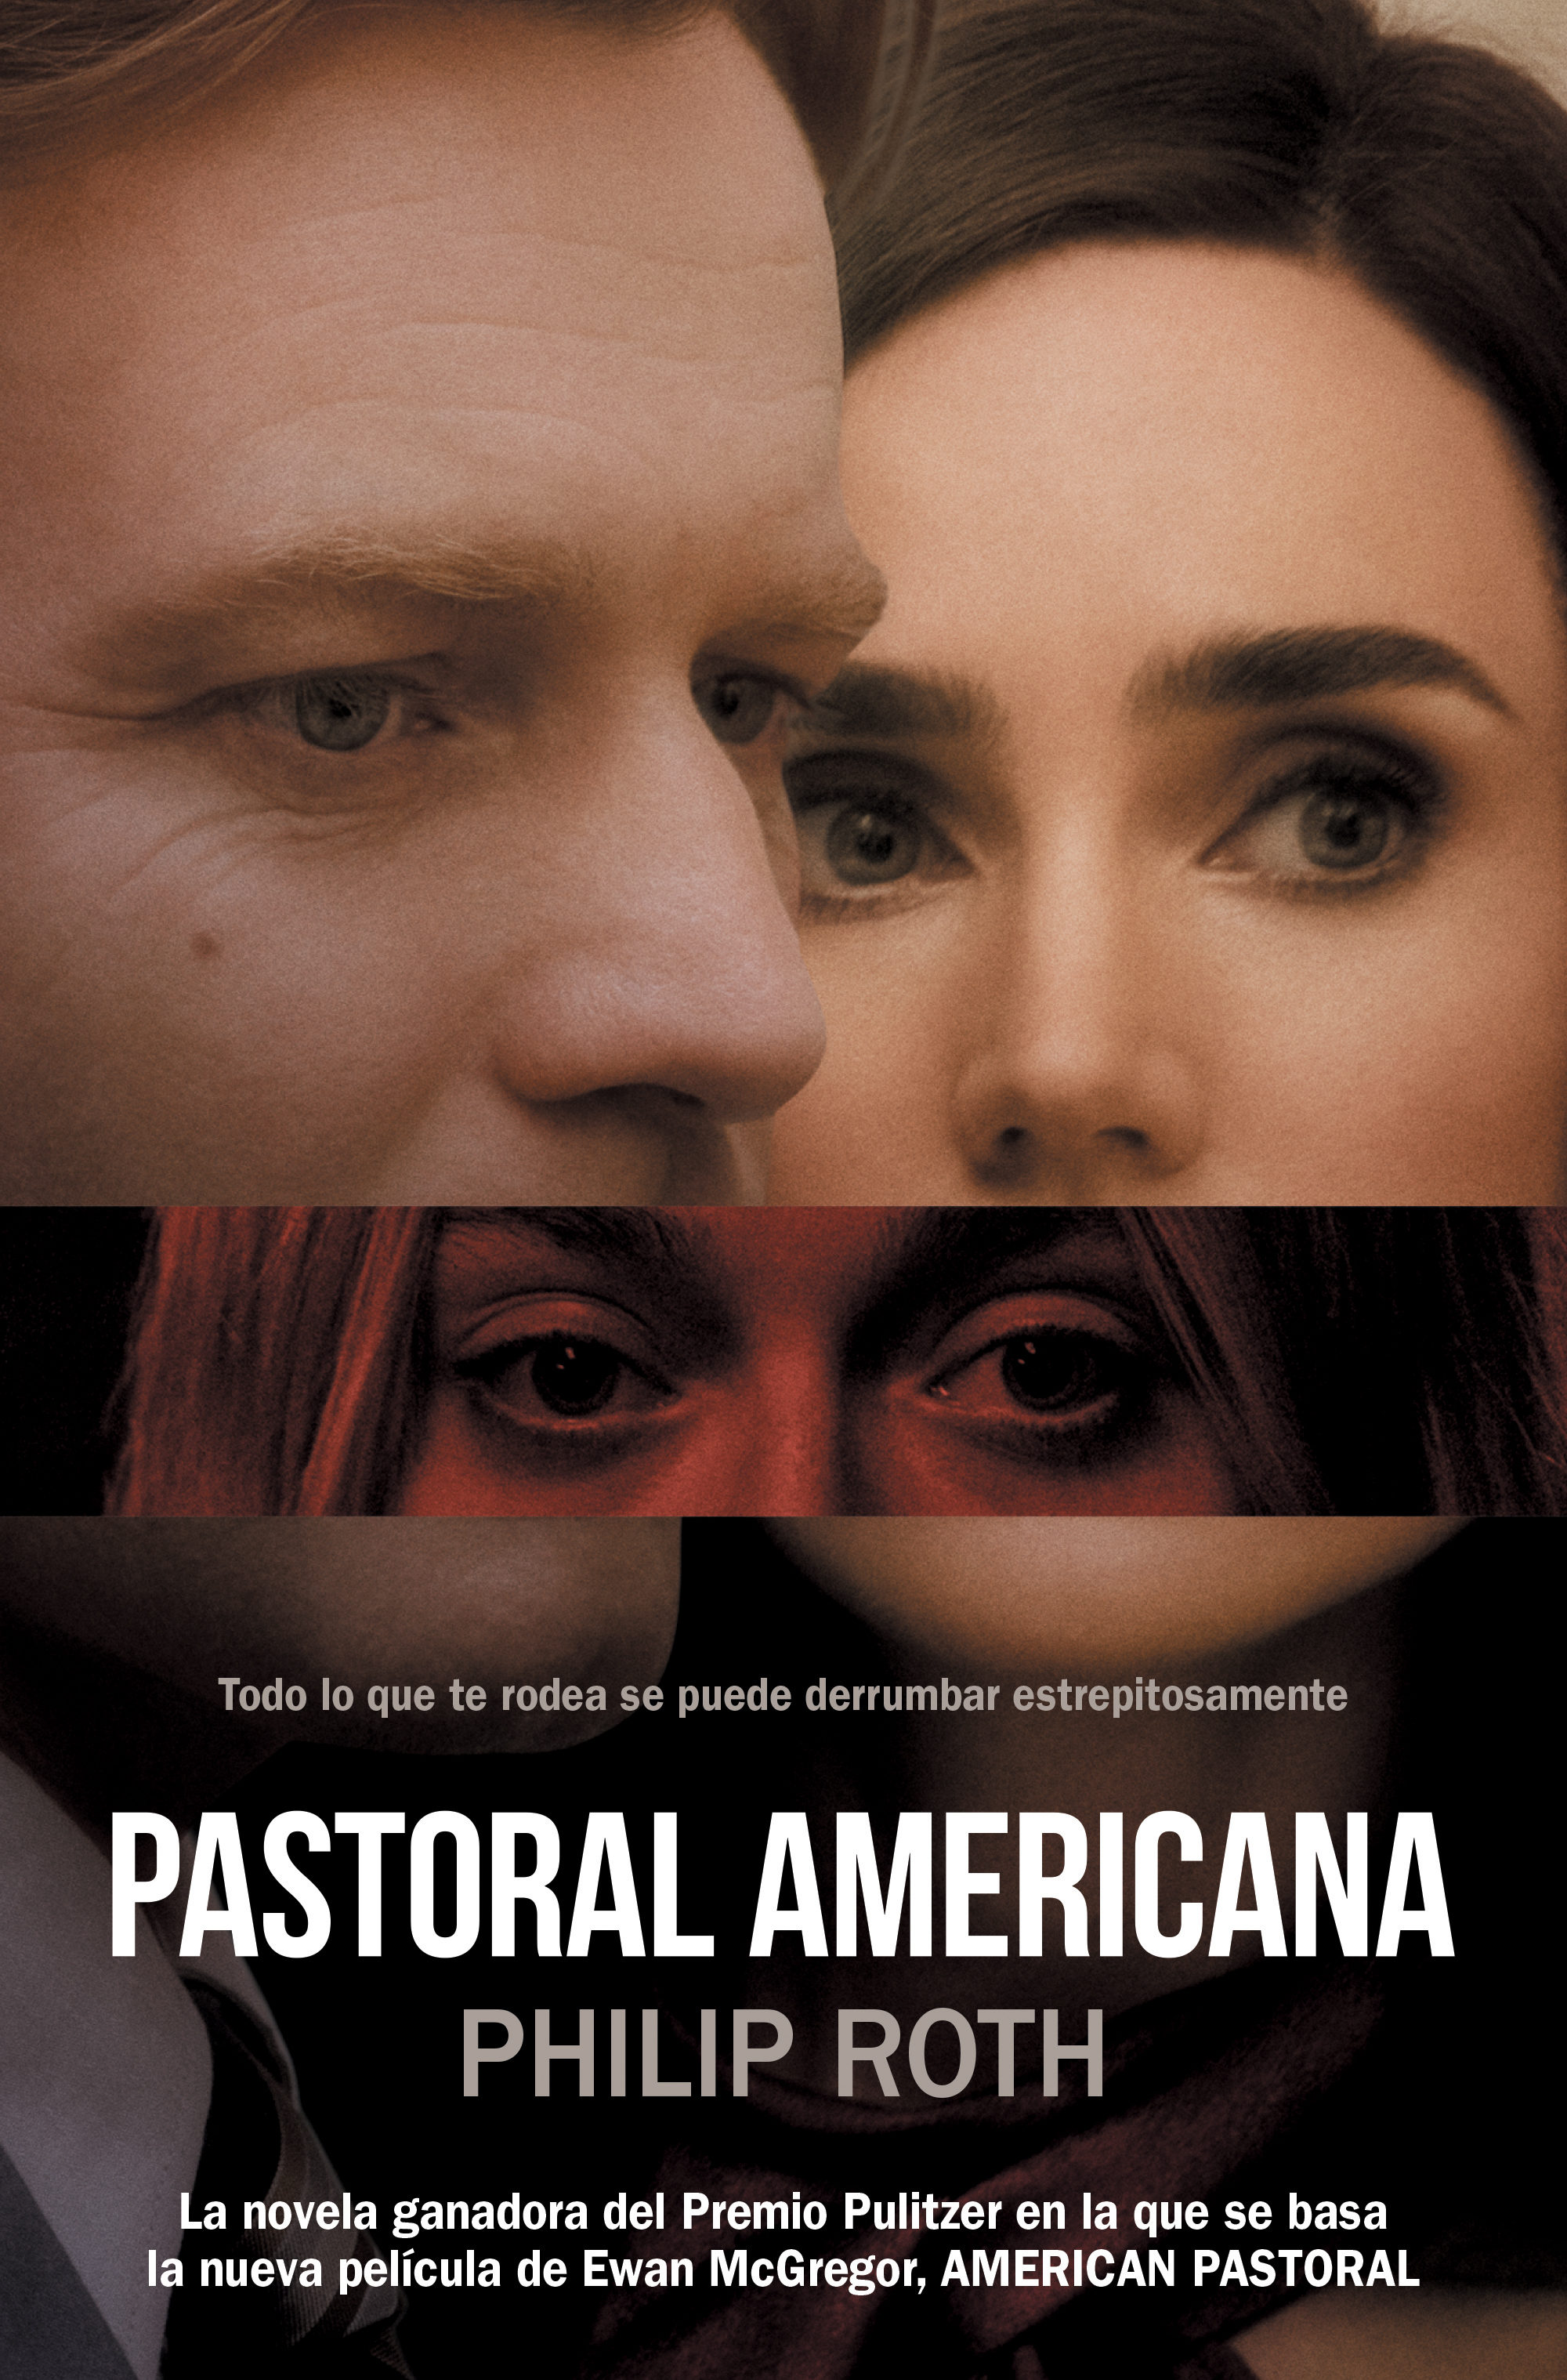 Pastoral Americana (ebook)philip Roth9788499896113